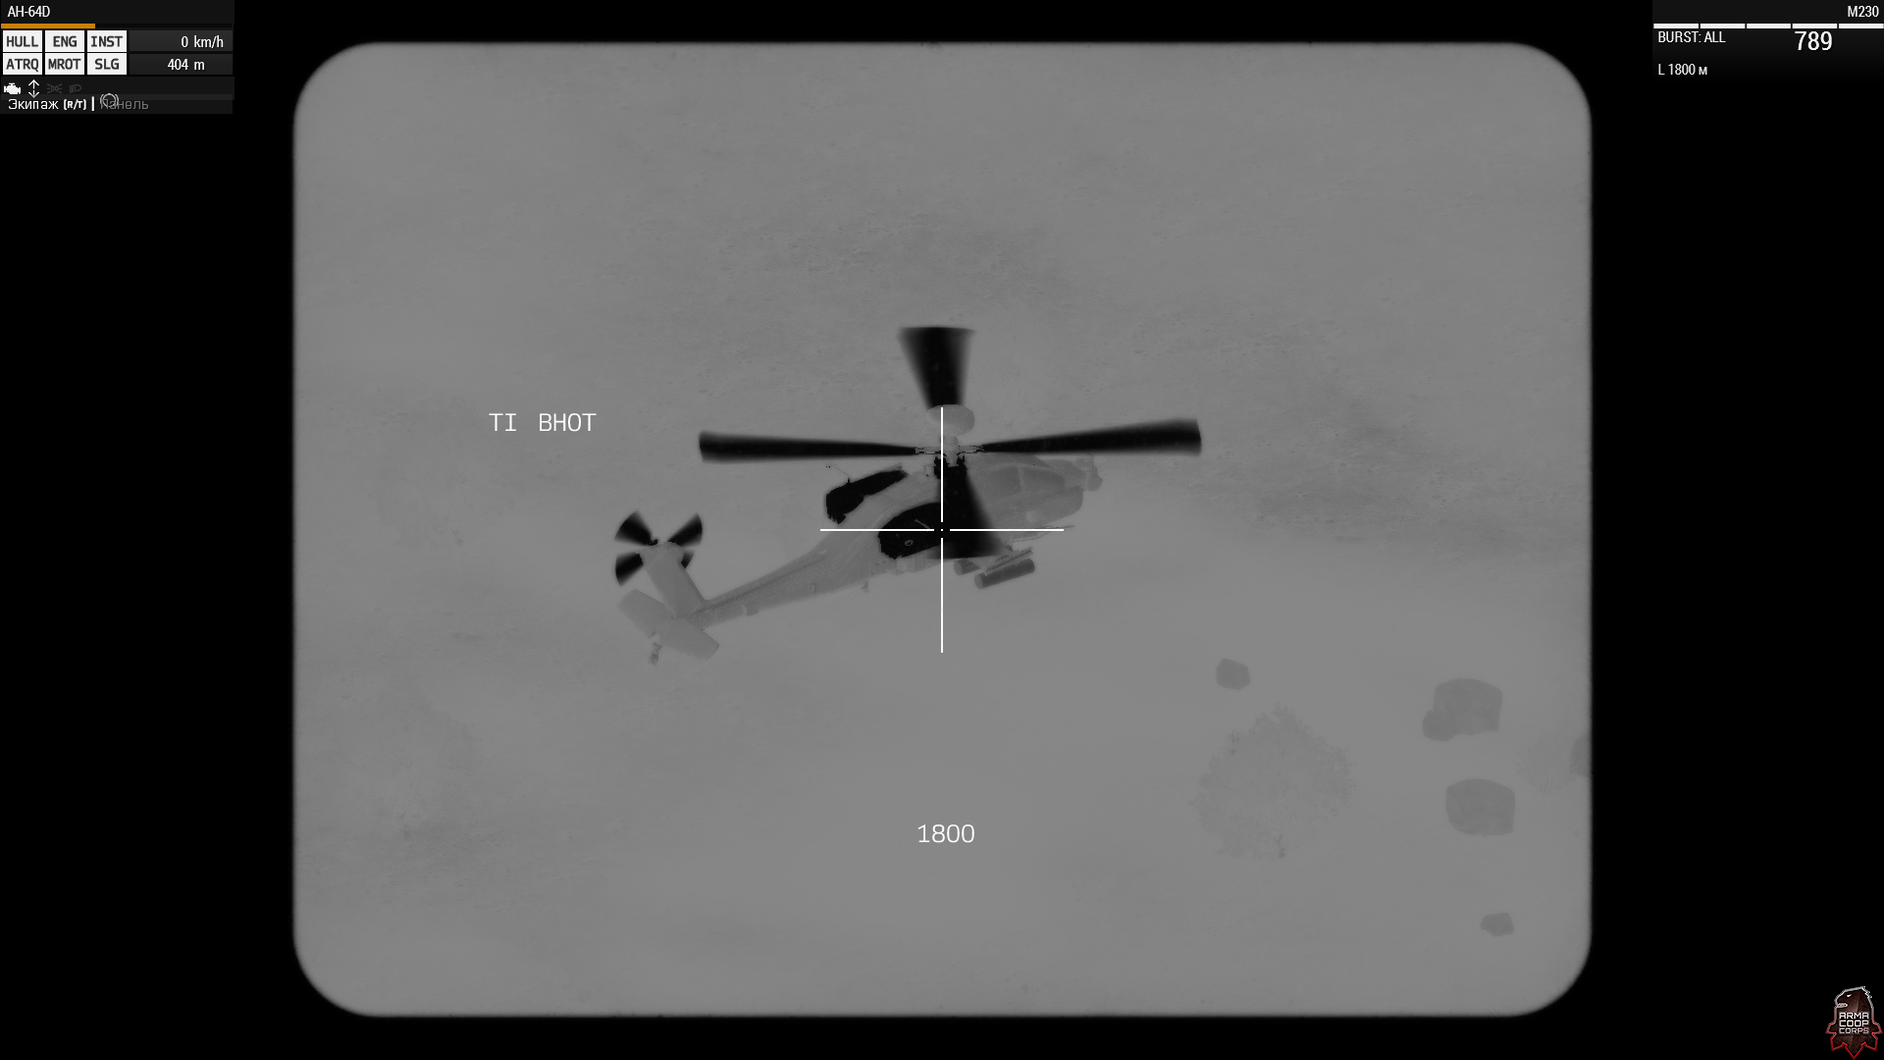 ArmA 3 Screenshot 2020.05.30 - 22.07.40.84.png